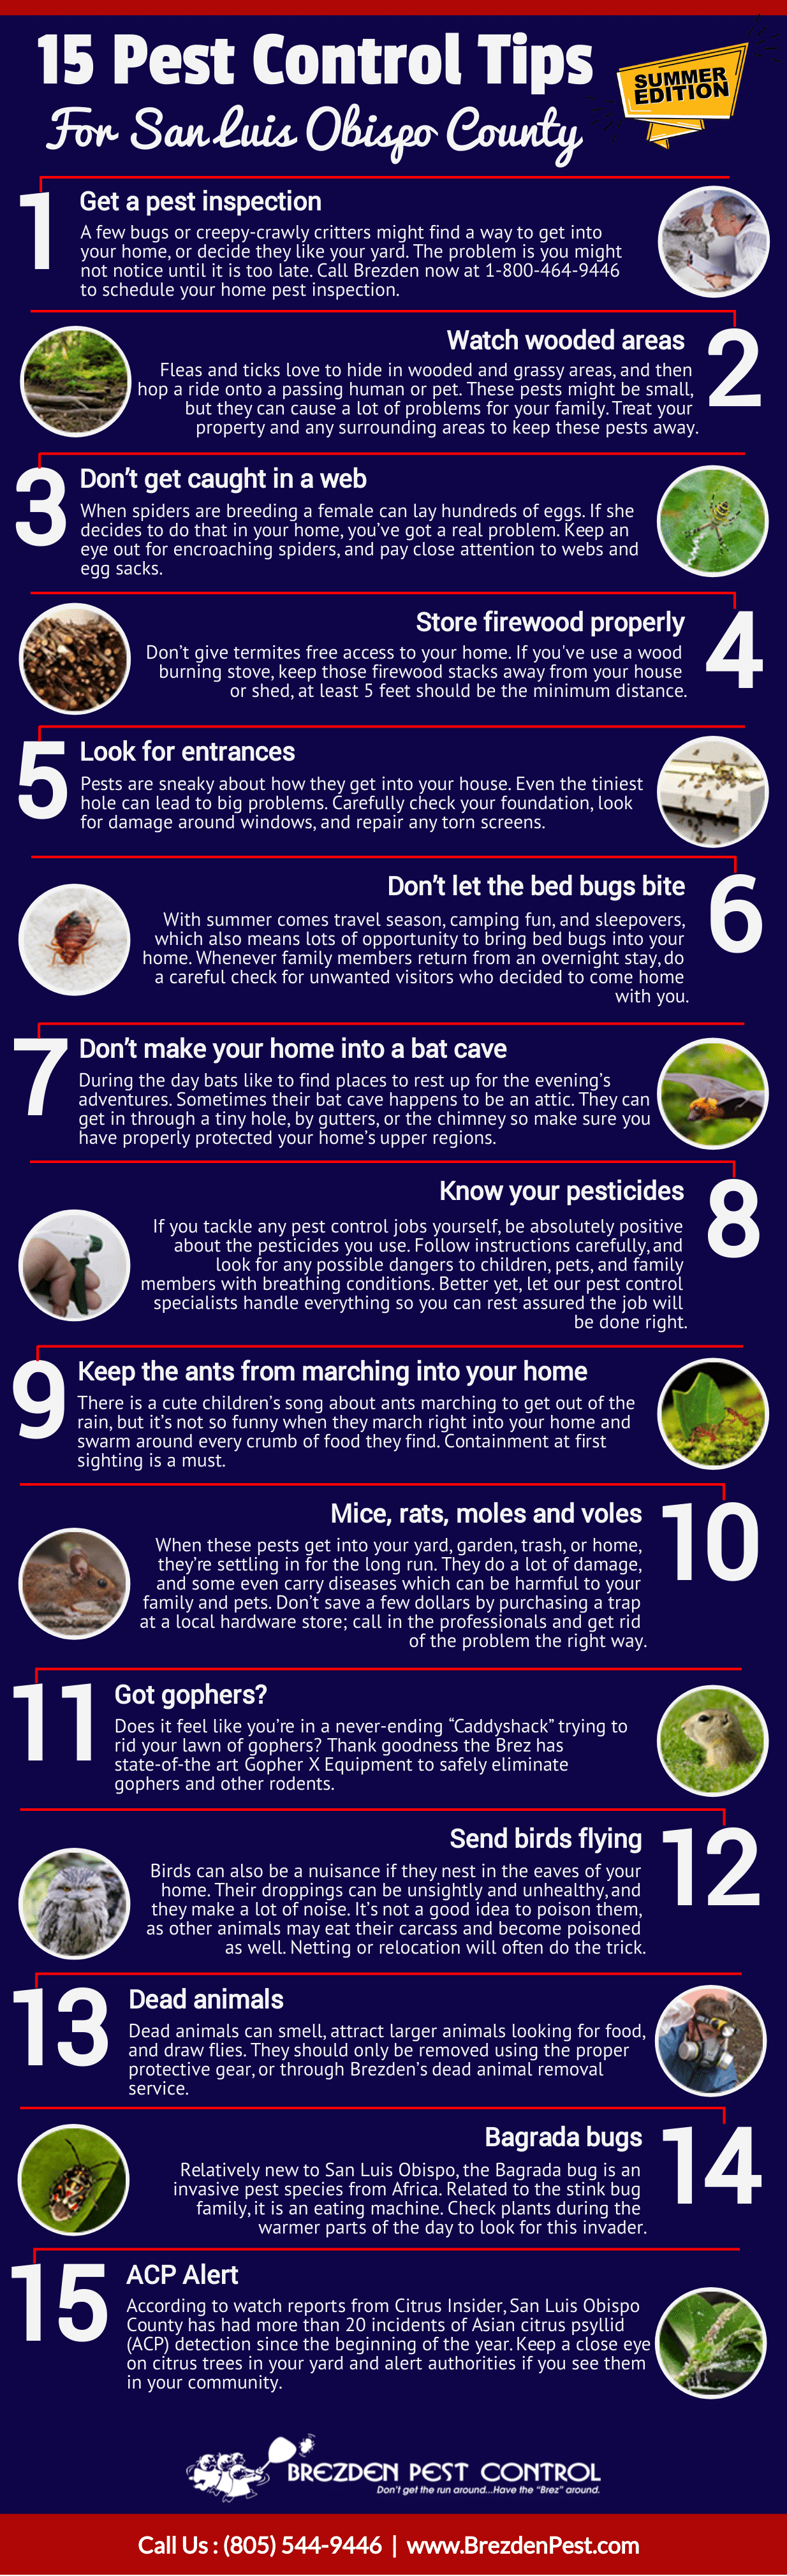 15 Pest Control Tips For San Luis Obispo County: Summer Season